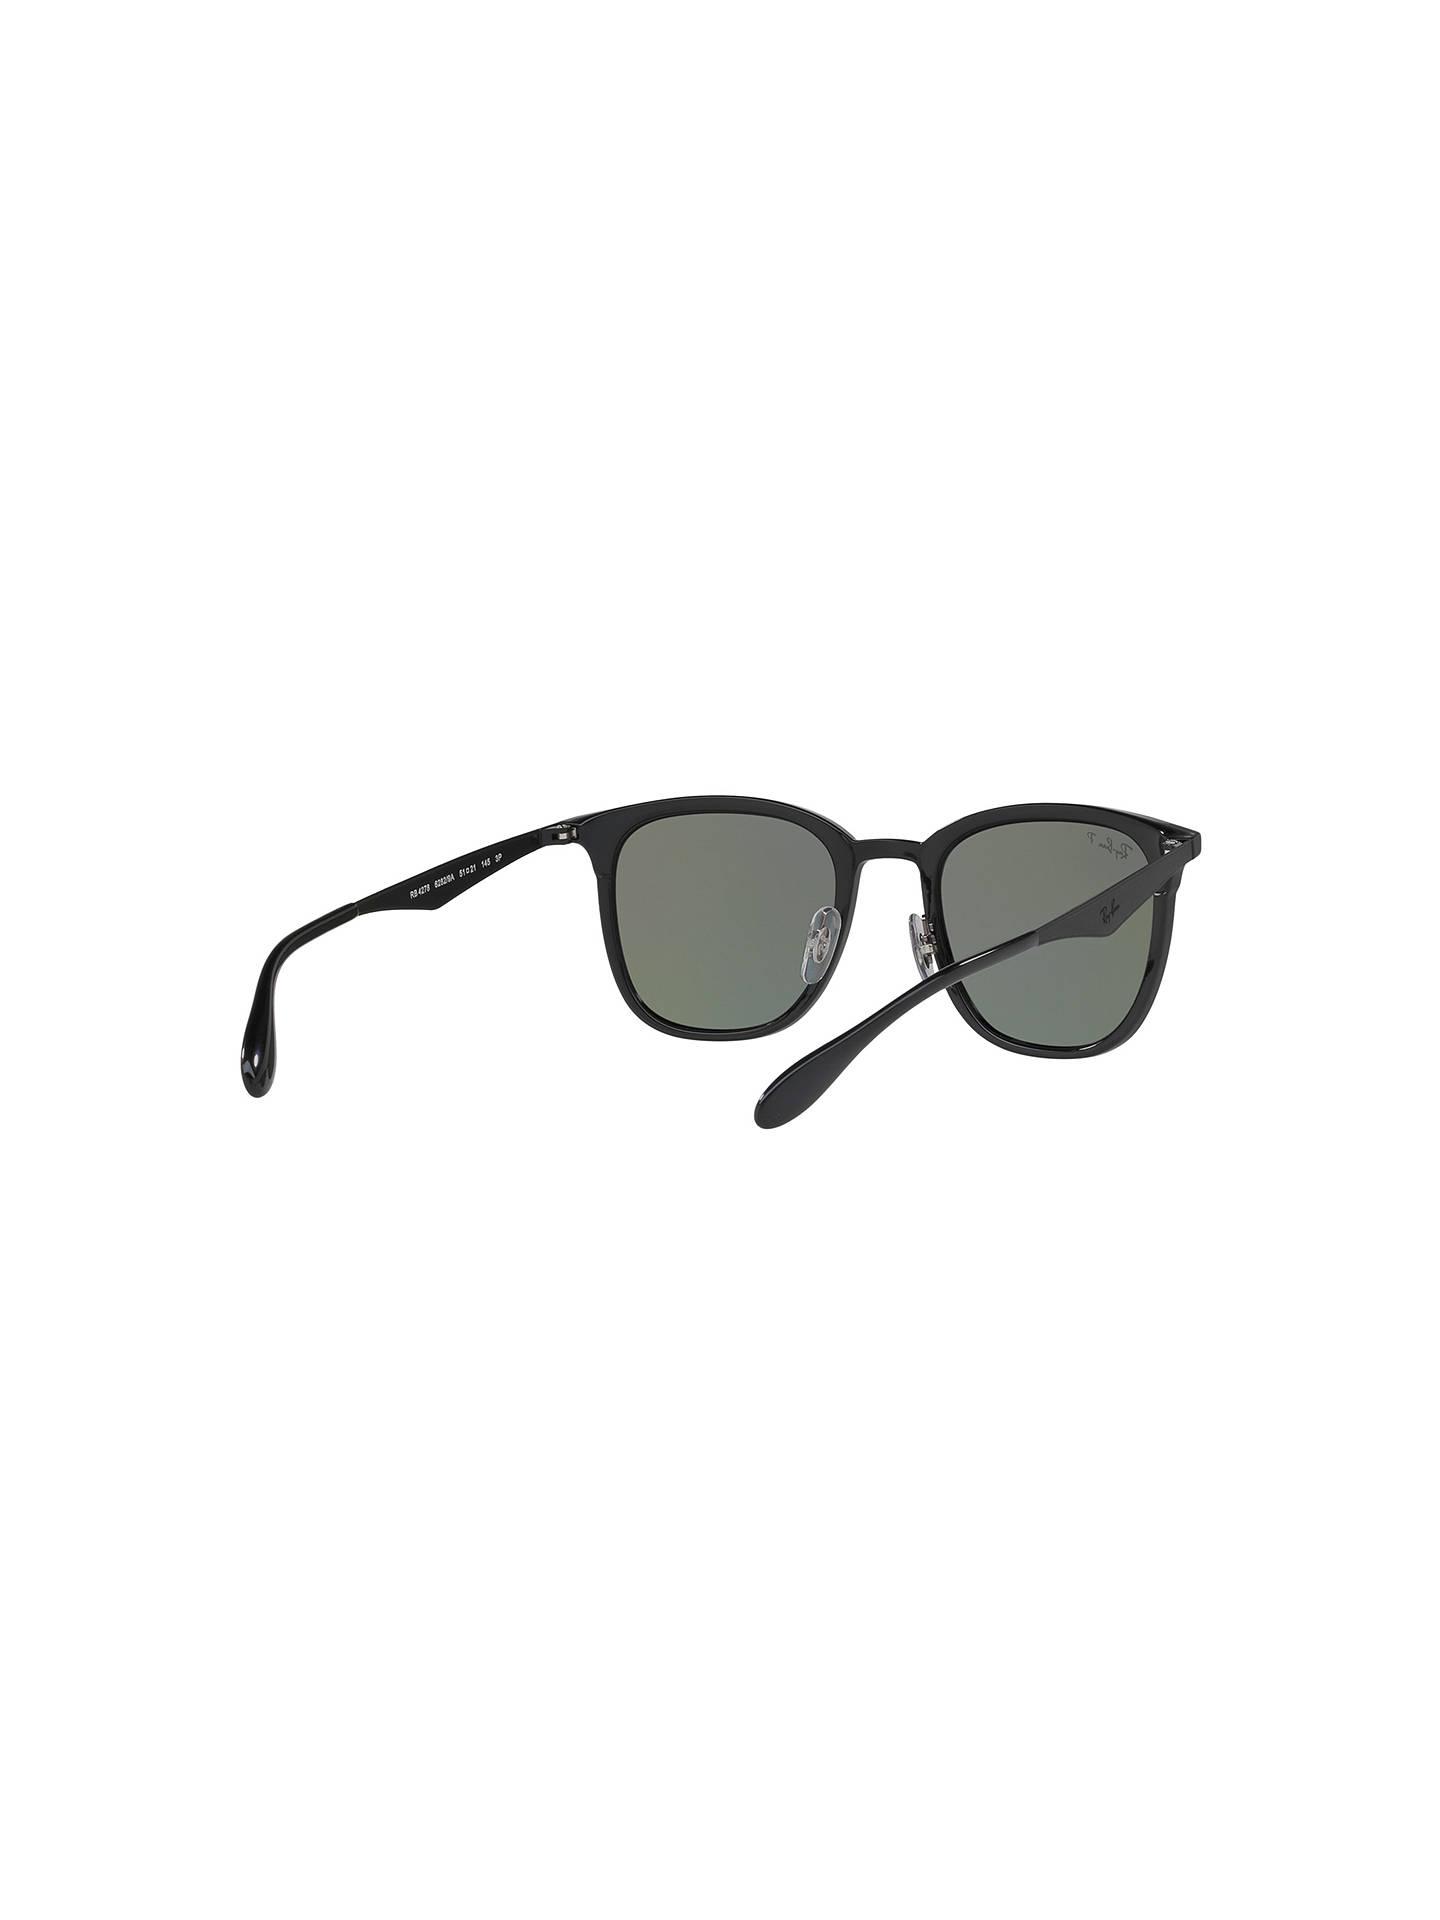 b88be1bc370 BuyRay-Ban RB4278 Polarised Square Sunglasses